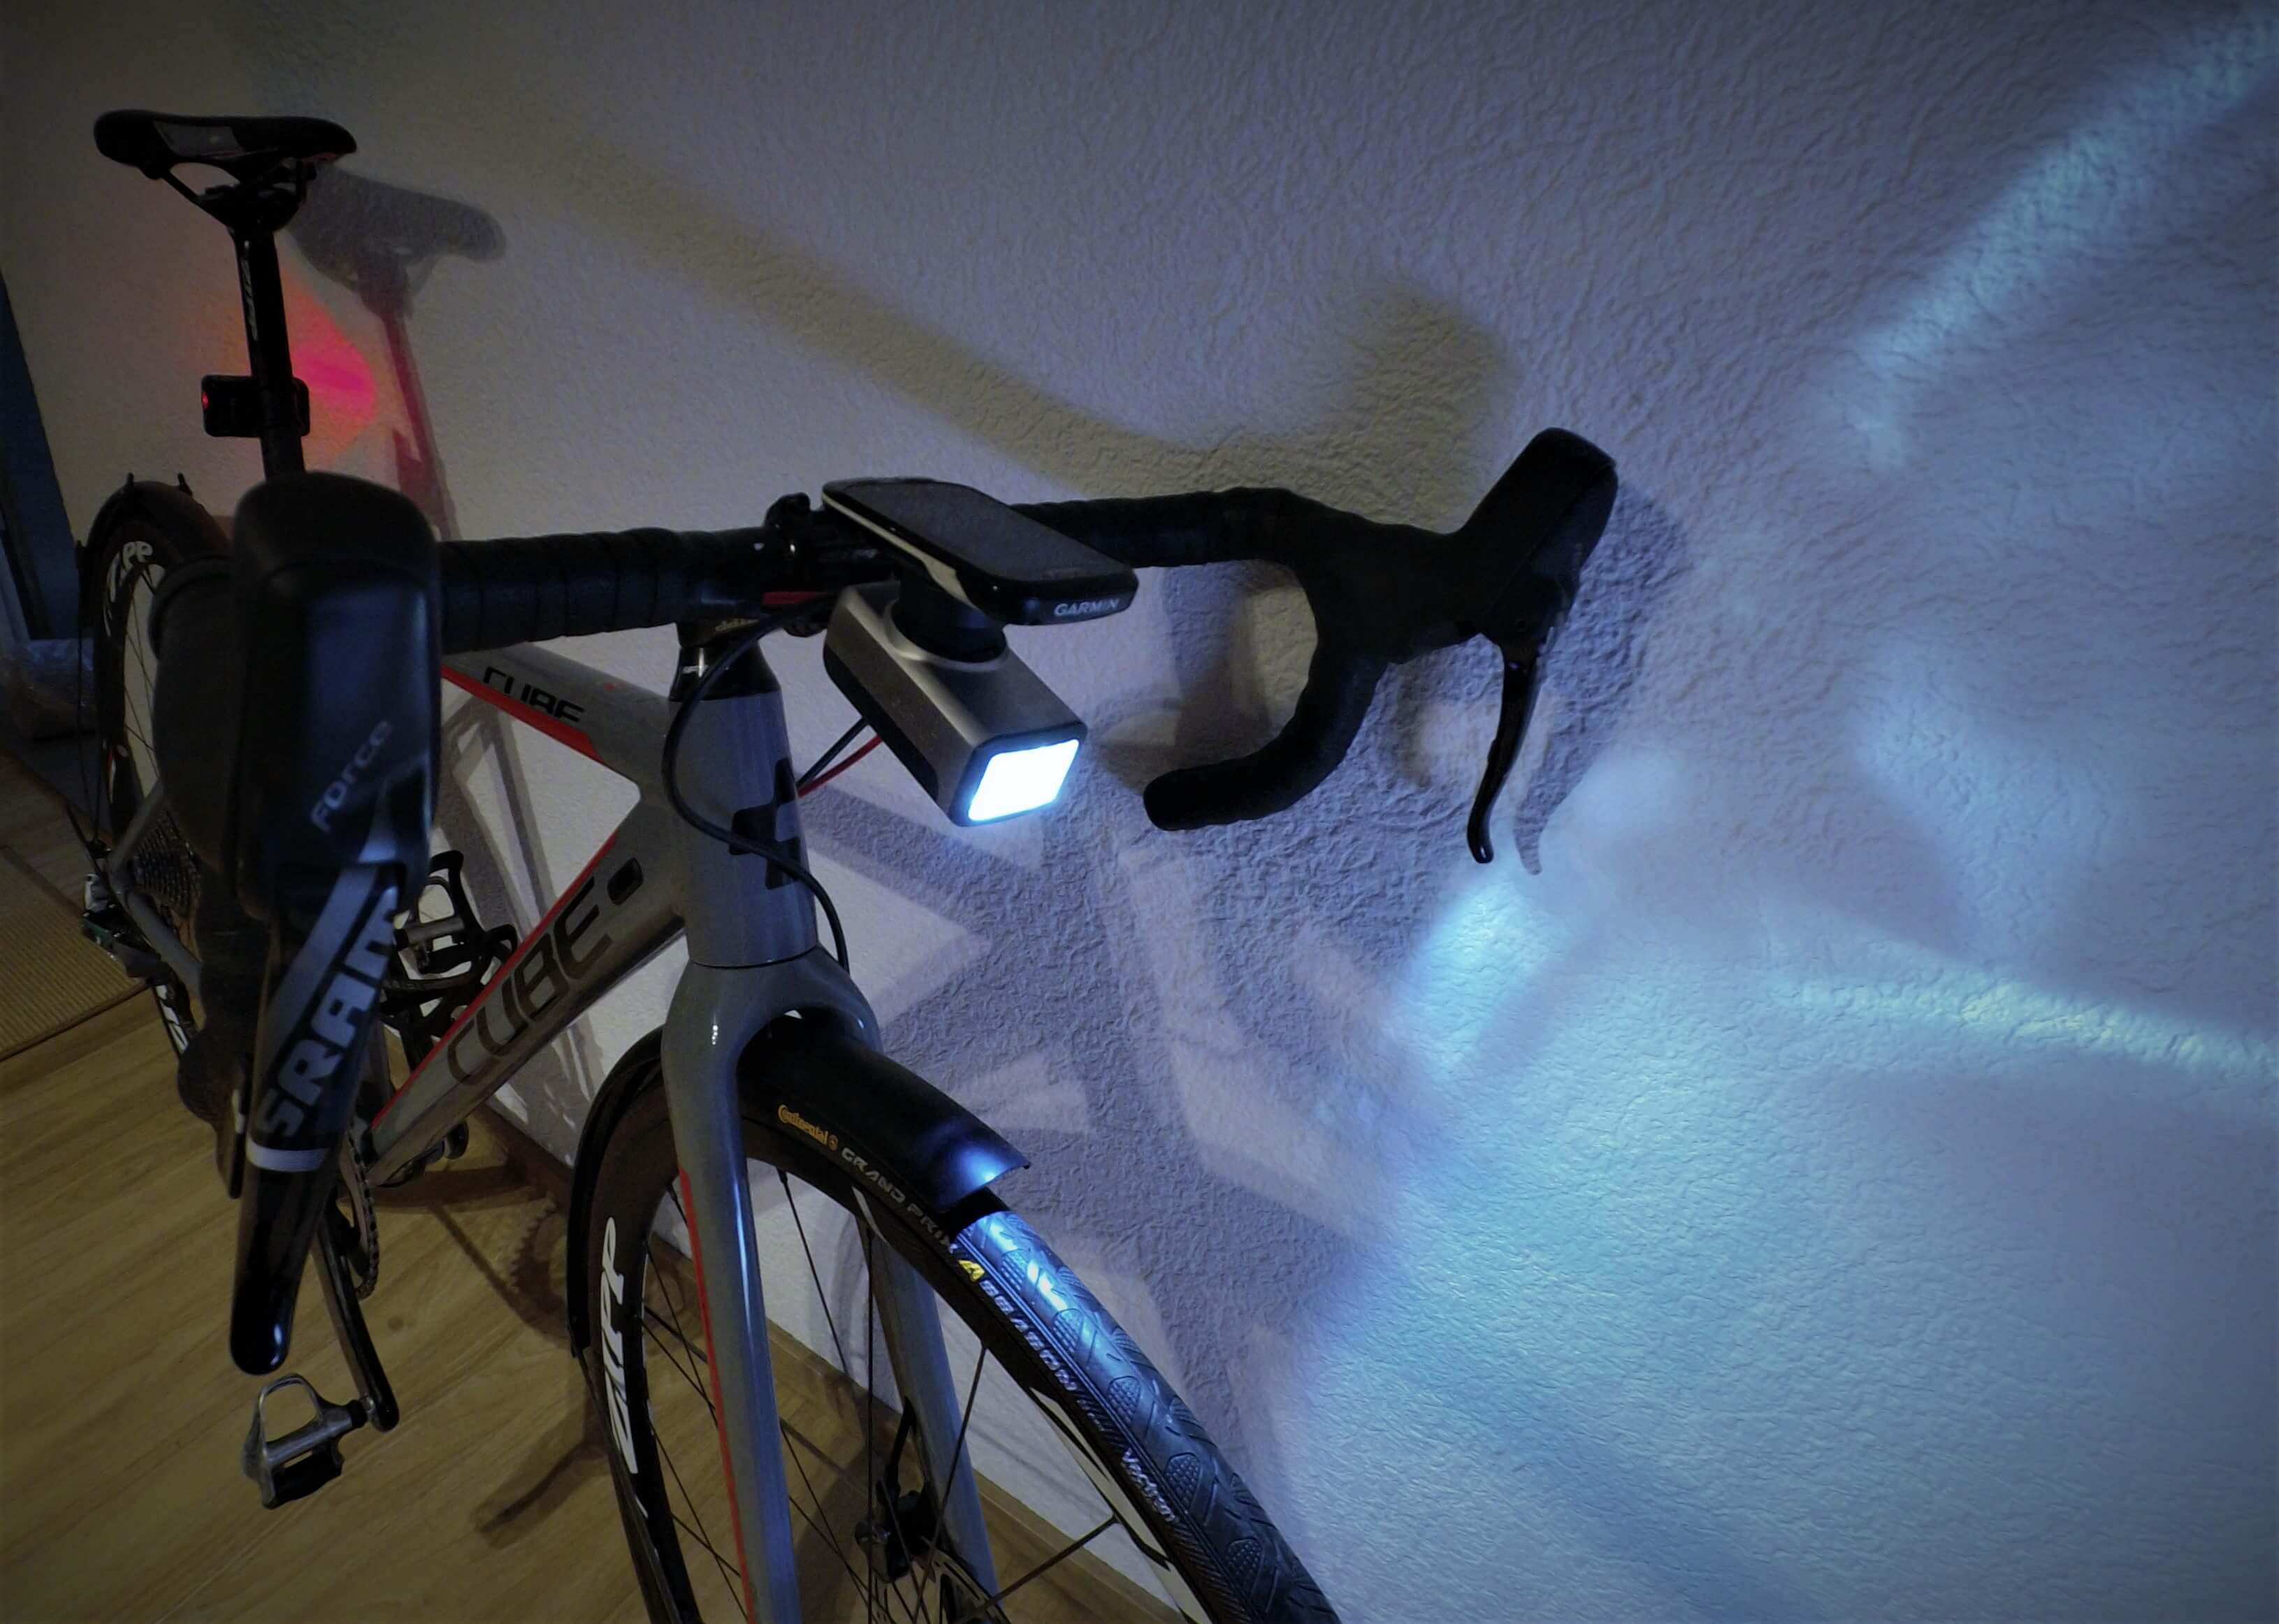 #Triday: Winterbike